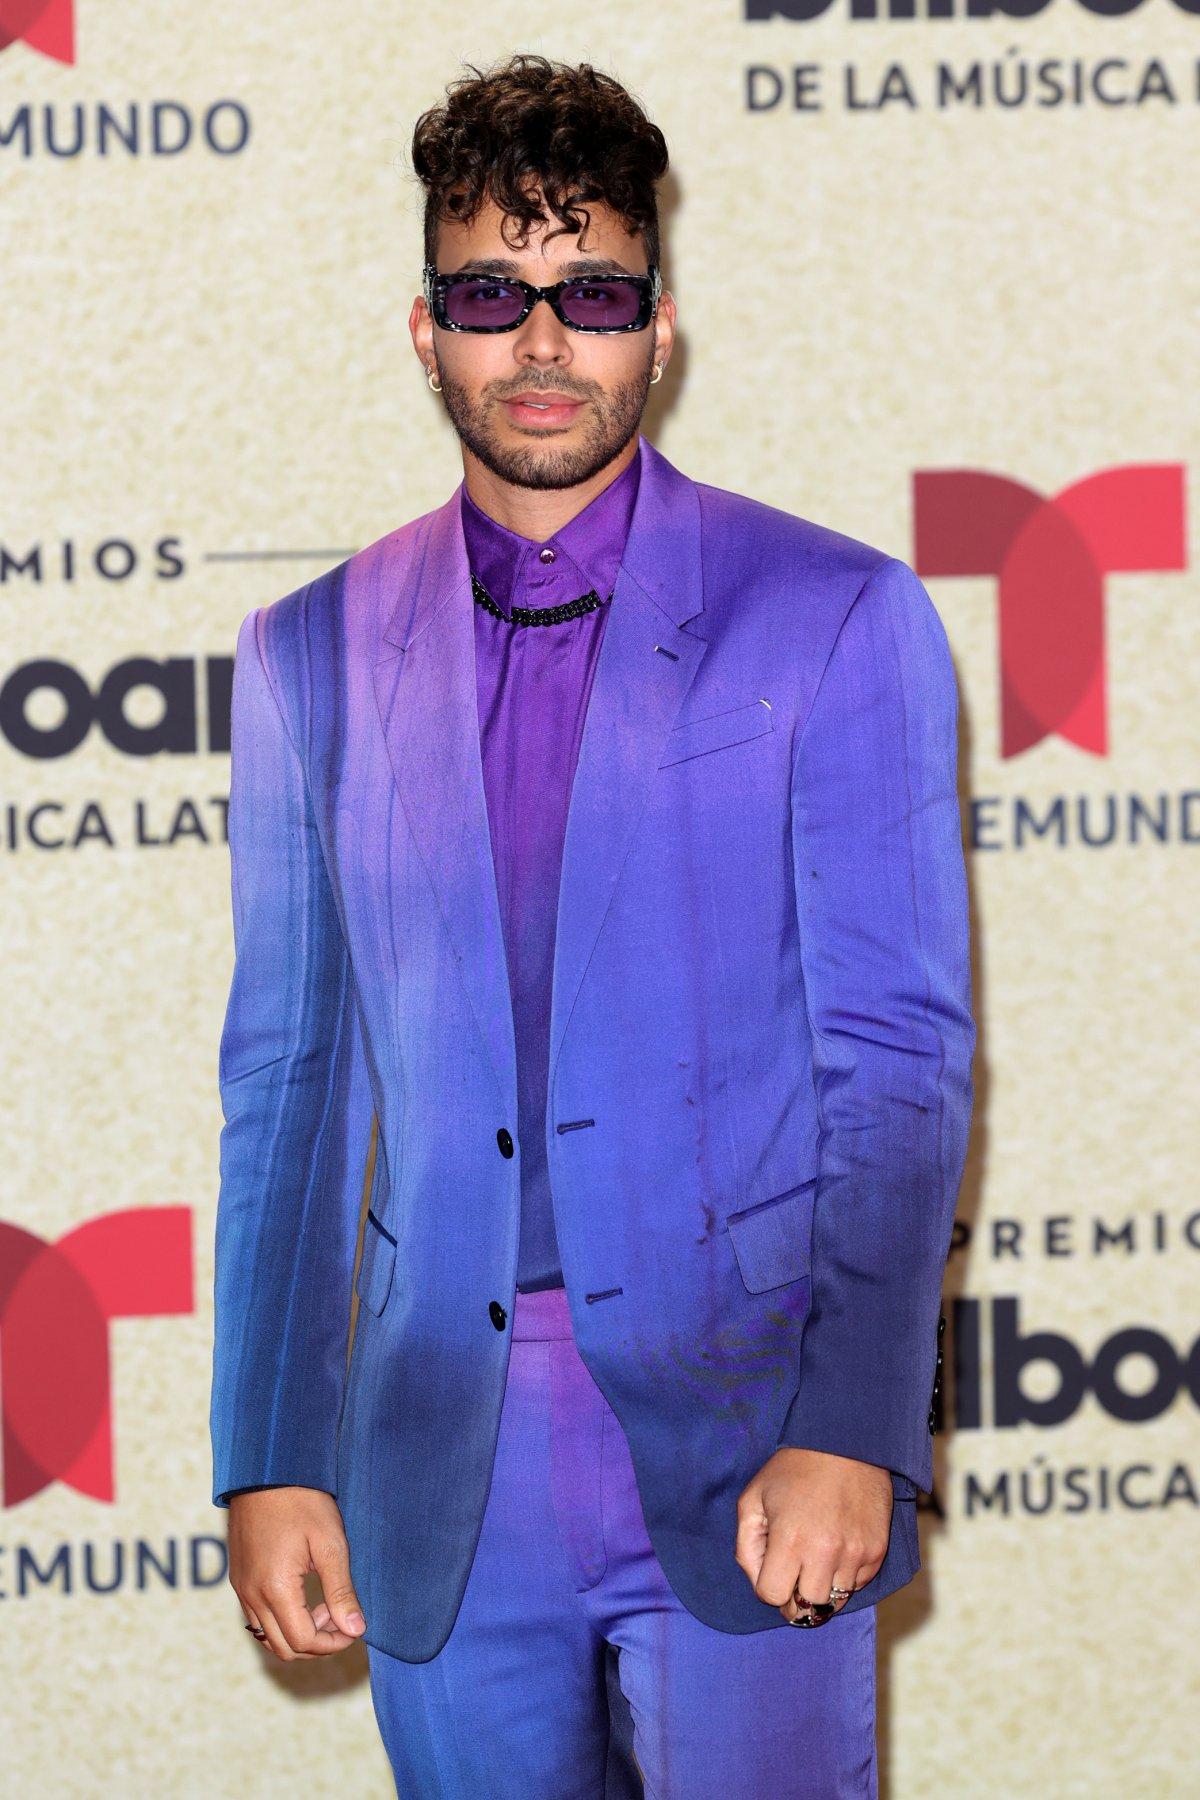 Prince Royce, at the 2021 Latin Billboard Awards